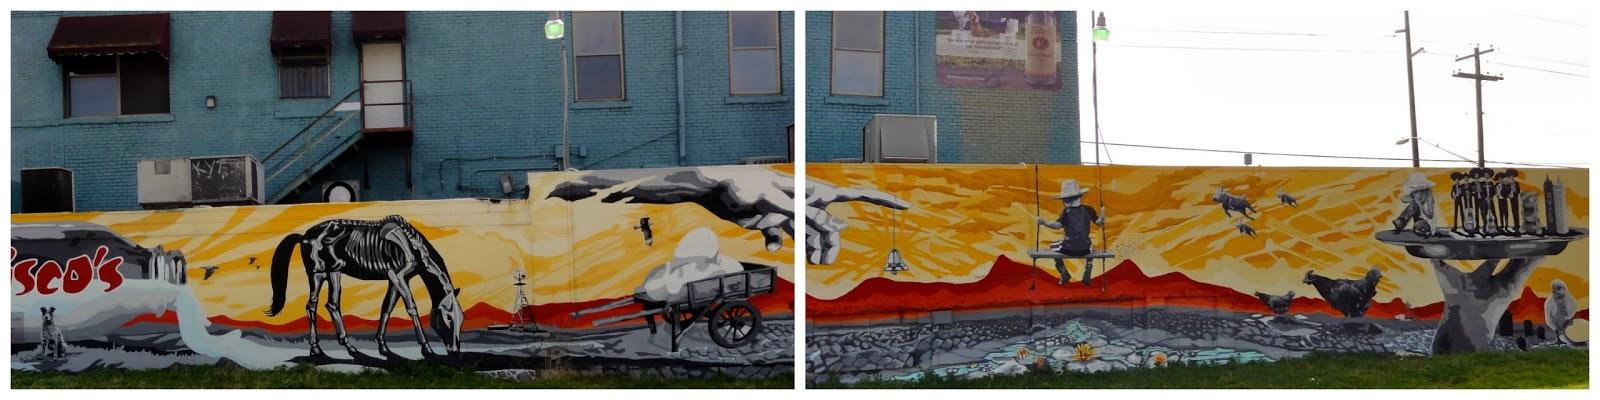 Austin mural Cisco's: 1511 E 6th